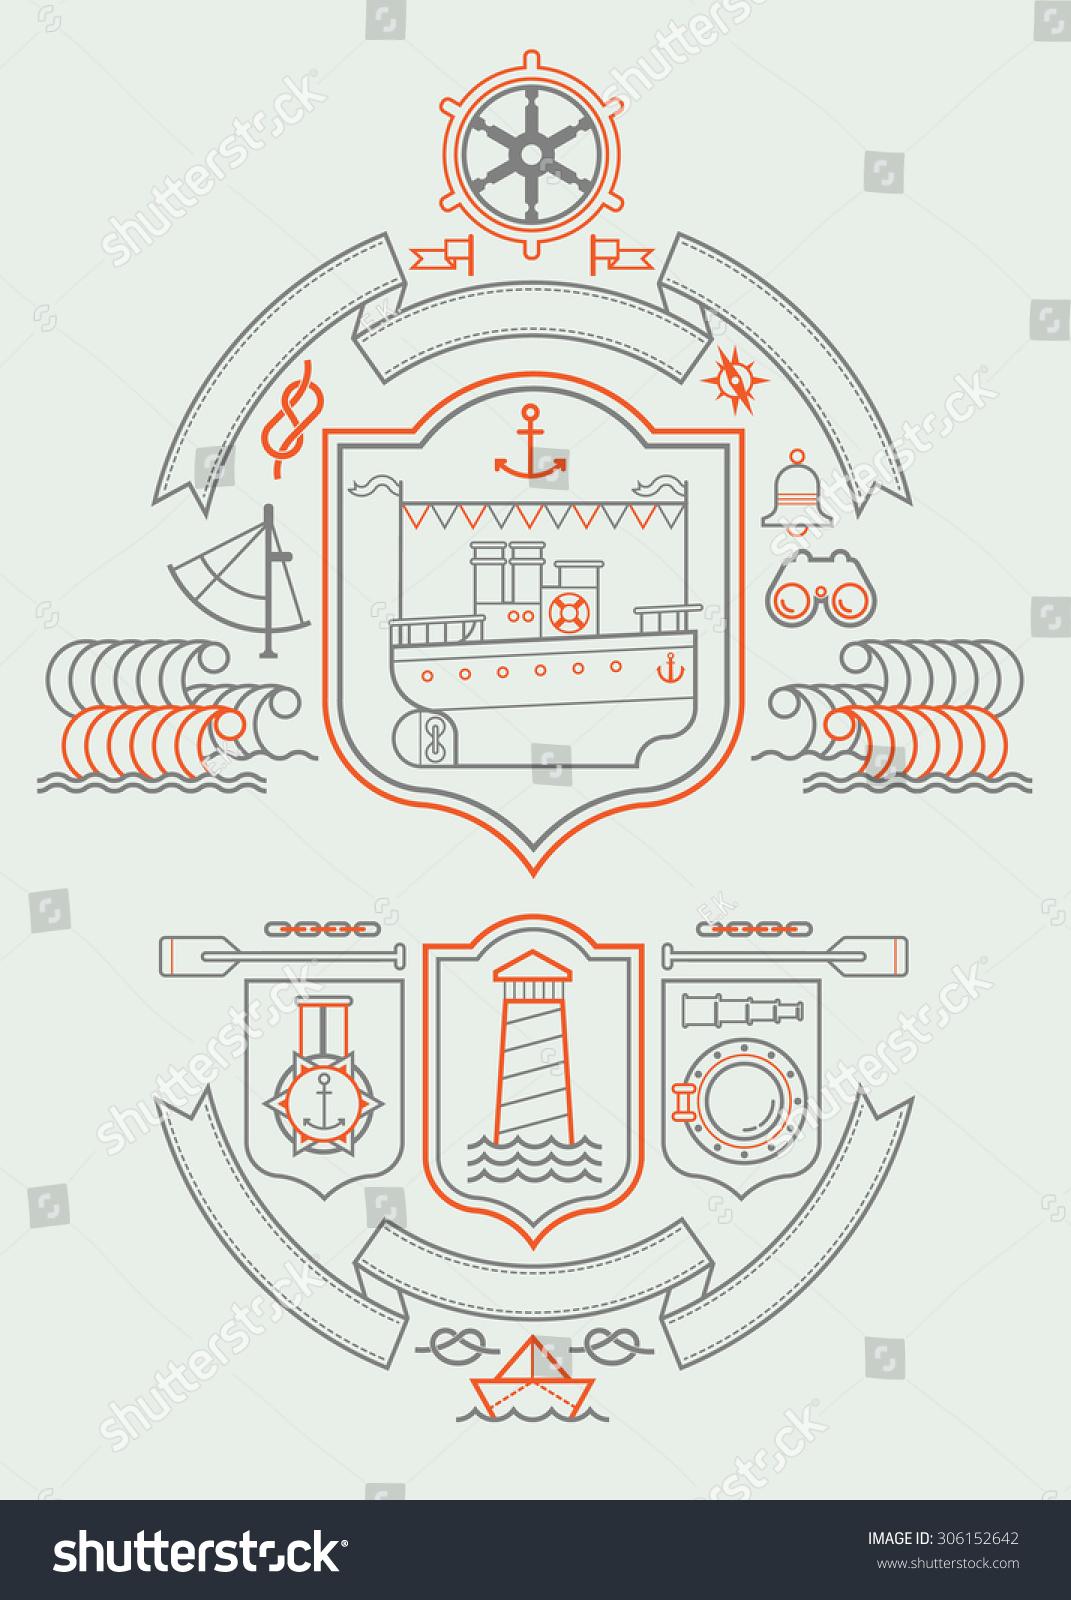 Composition sailing symbols cruise ship stock vector 306152642 composition with sailing symbols and cruise ship buycottarizona